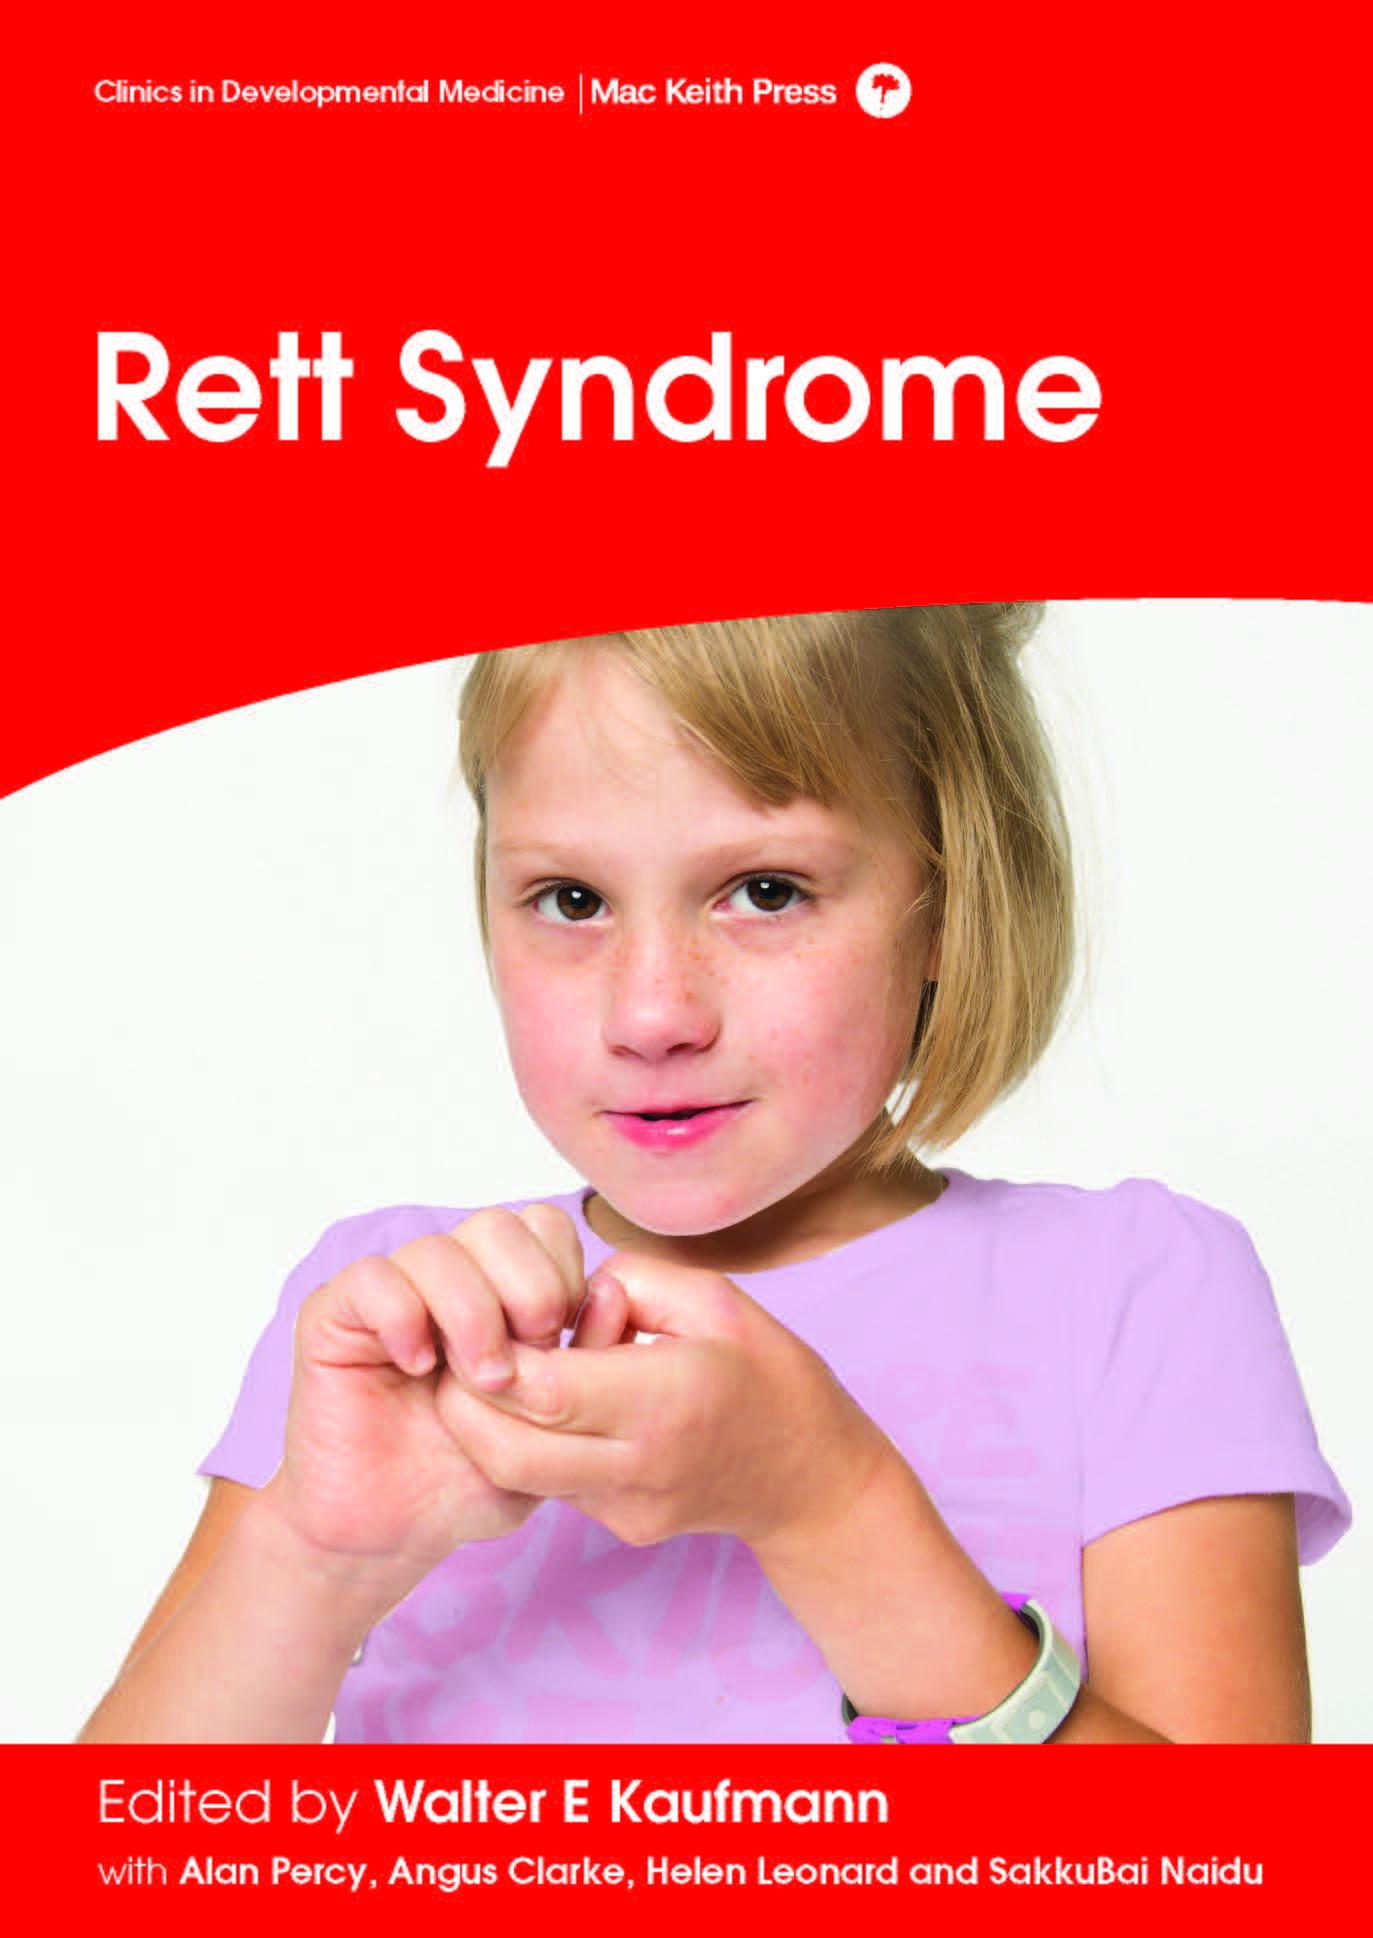 Mac Keith Press Rett Syndrome book by Kaufmann cover